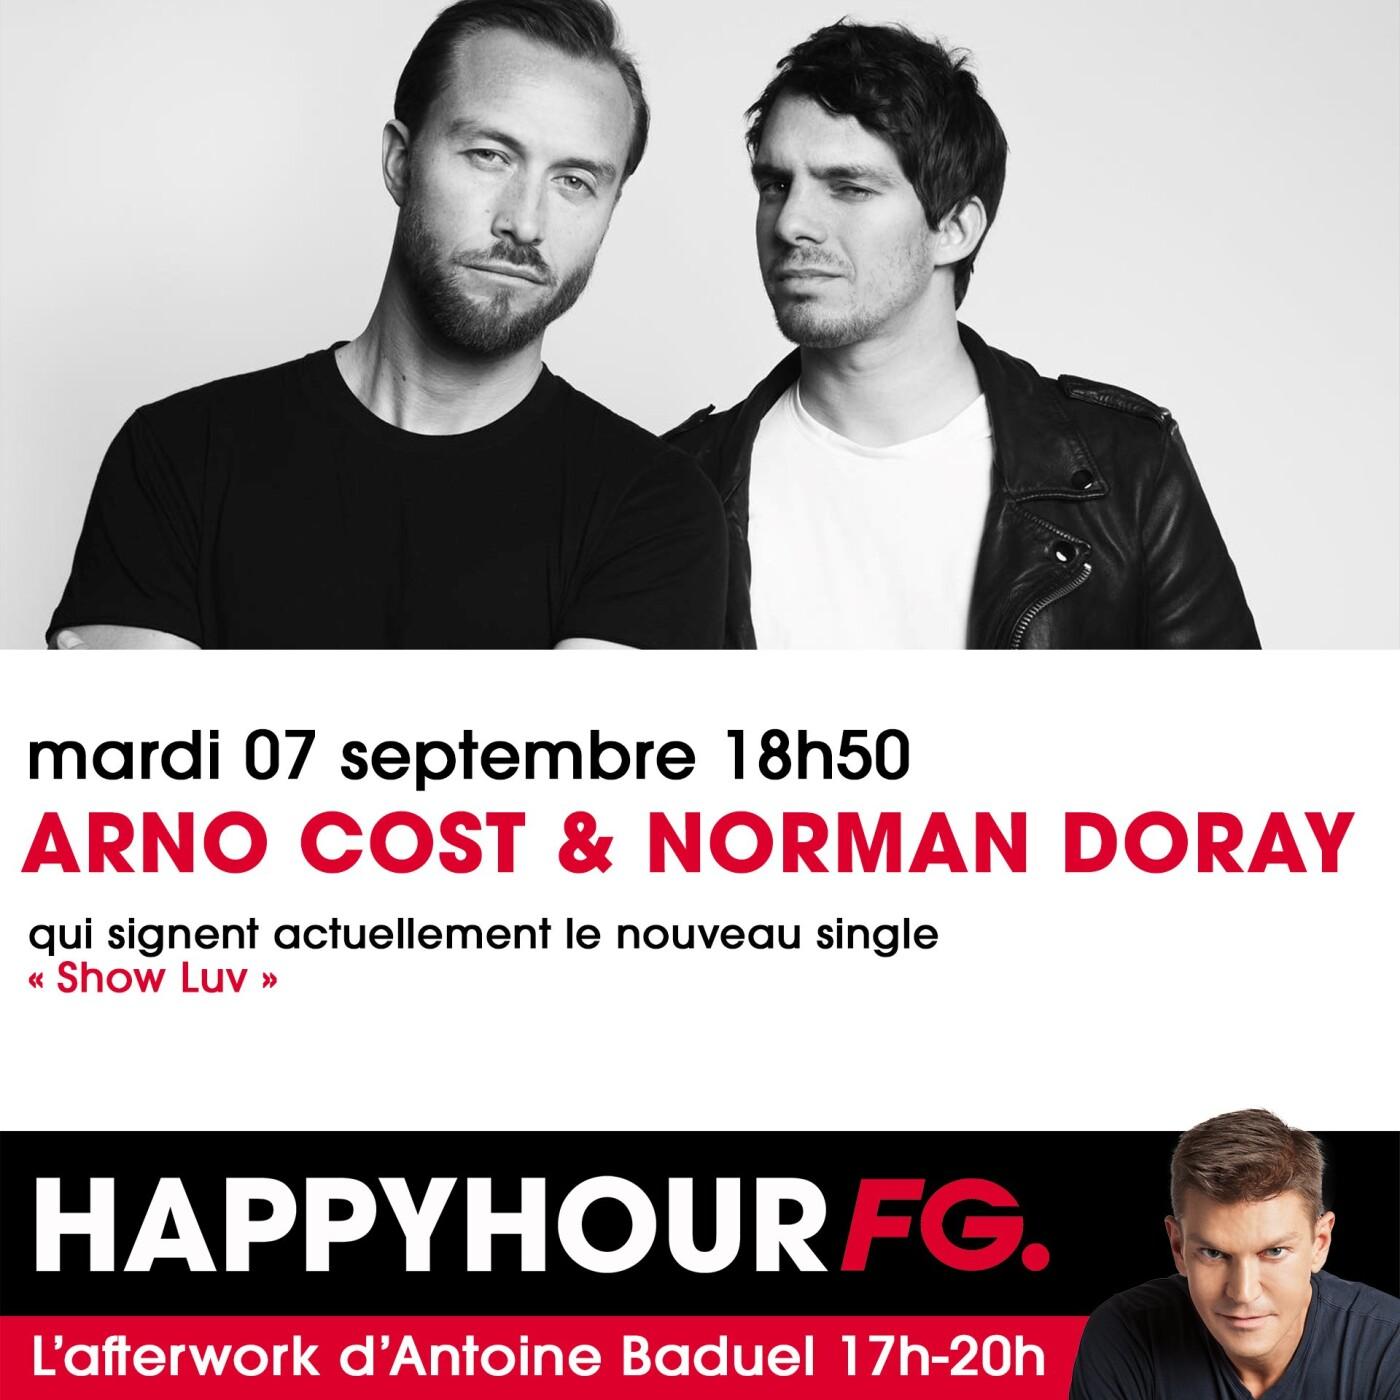 HAPPY HOUR INTERVIEW : ARNO COST & NORMAN DORAY